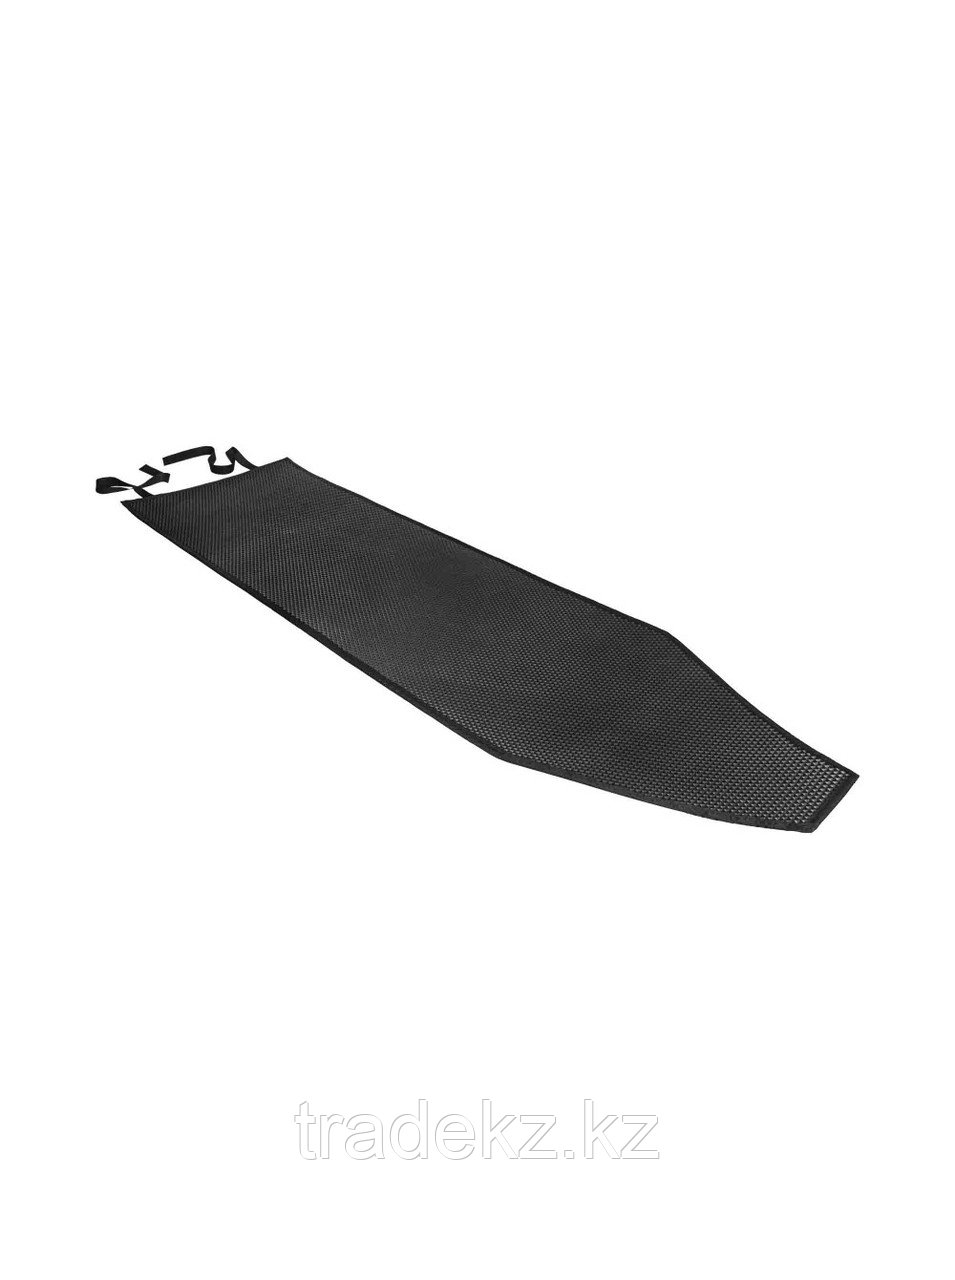 Коврик ЭВА EVA Proff по форме дна для лодки АПАЧИ 3500 НДНД (APACHE 3500 НДНД)